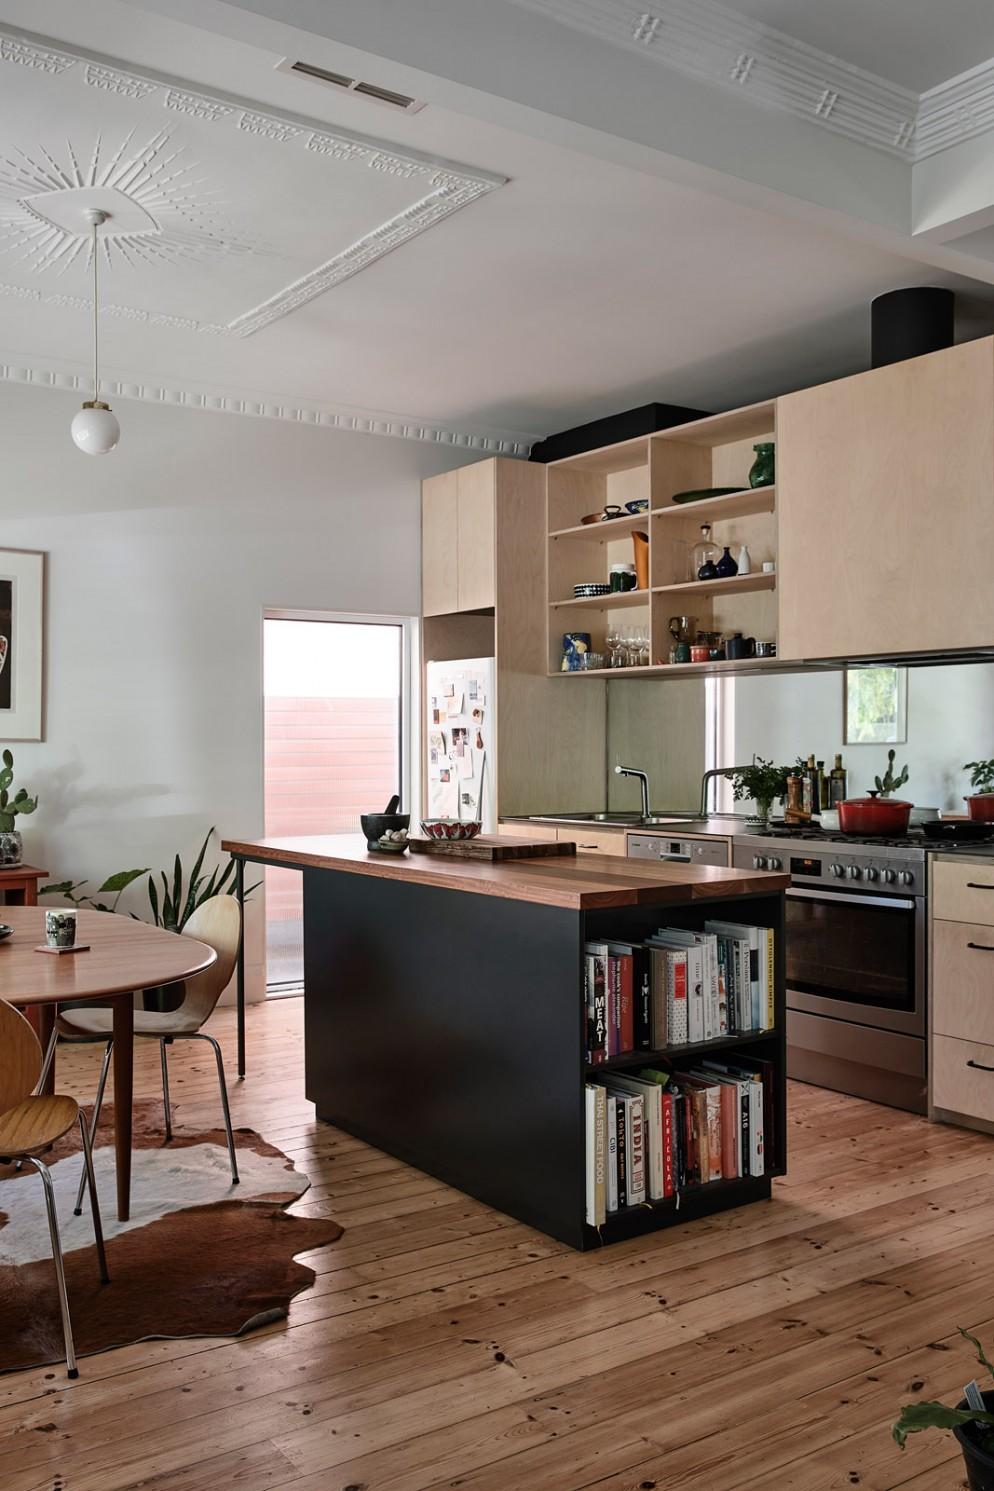 13 AMA-Terracotta_House_Derek_Swalwell